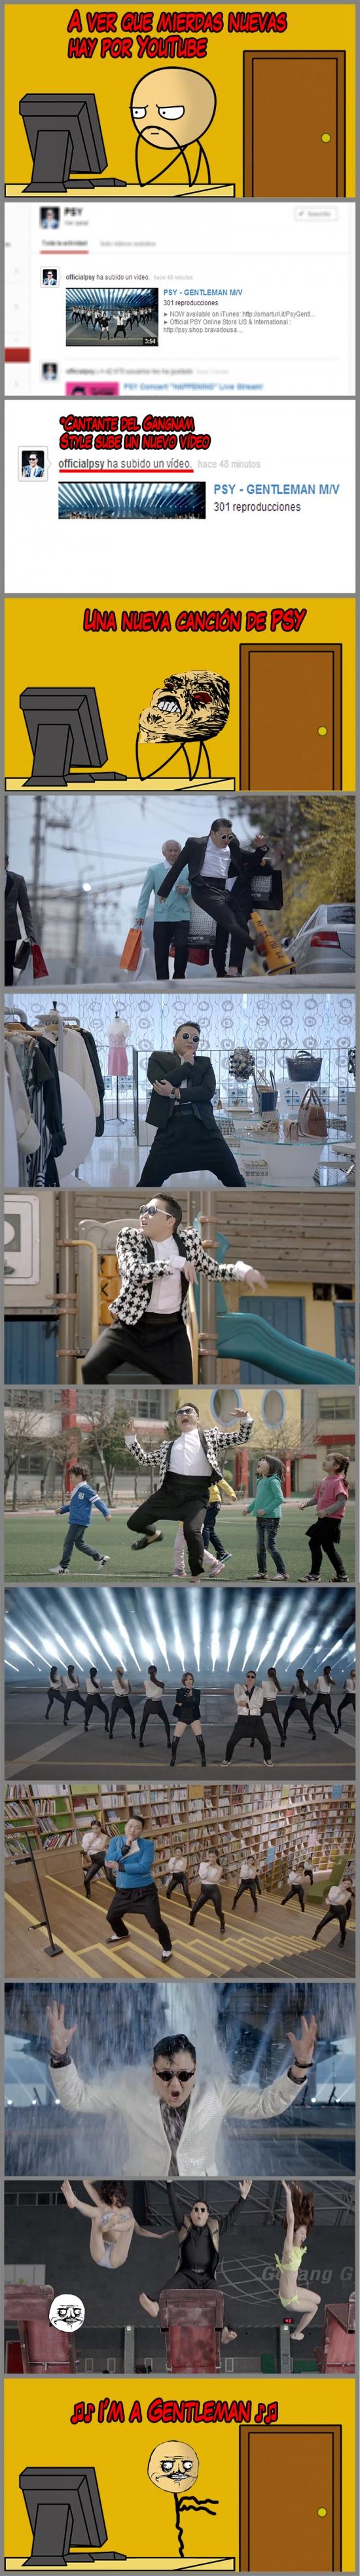 Gangnam Style,Gentleman,me gusta,nuevo,PSY,raisins,videoclip